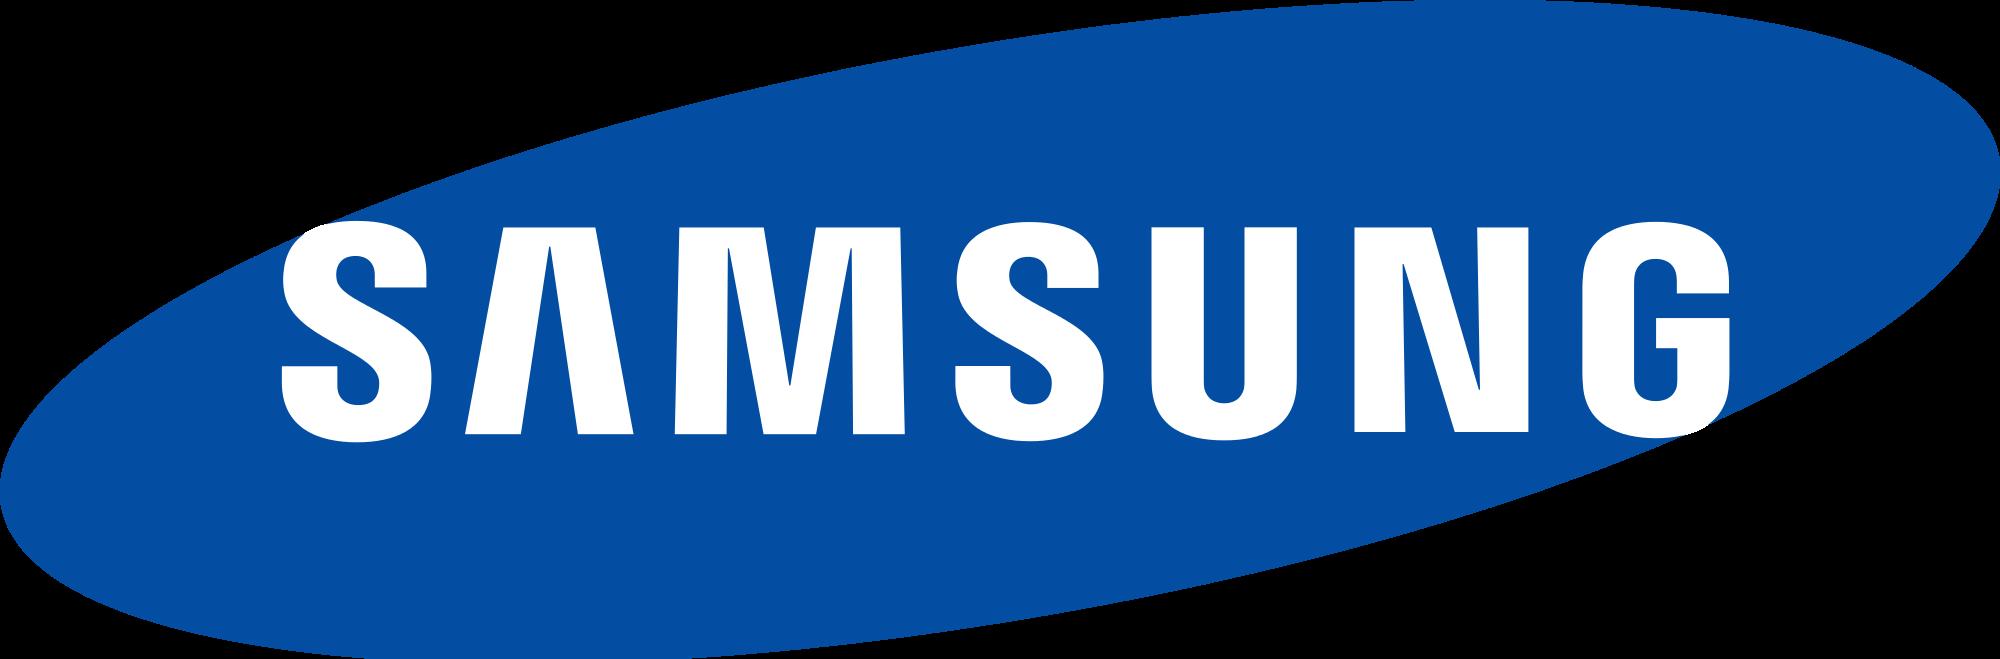 samsung logo transparent png stickpng